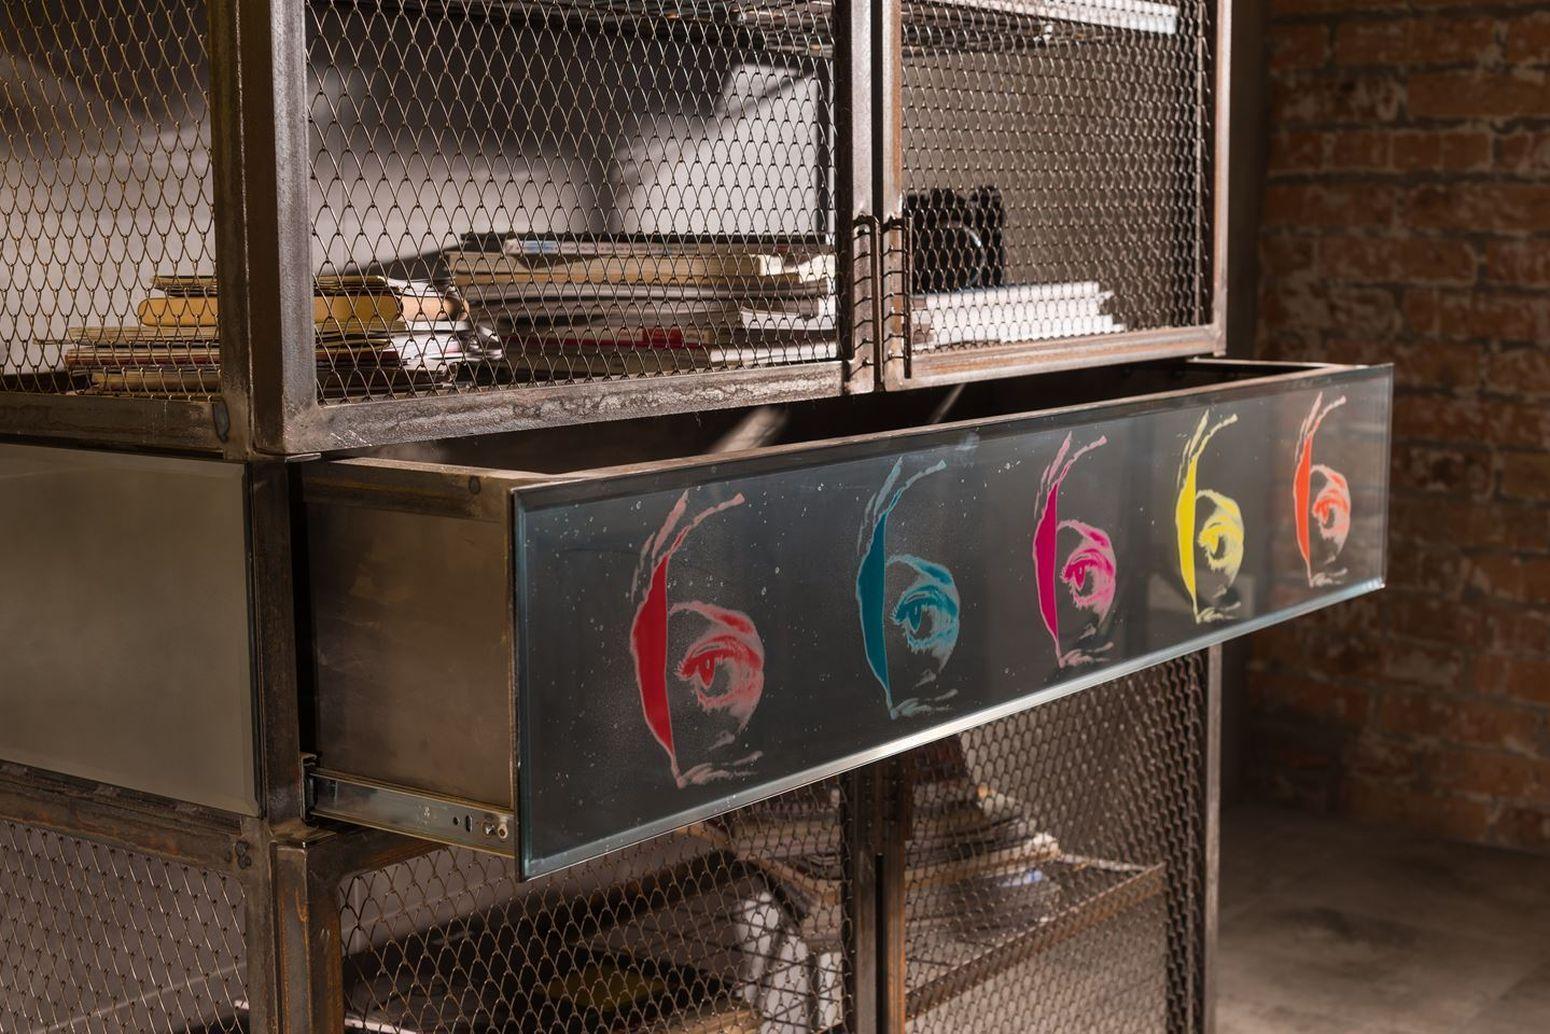 металлический стеллаж лофт